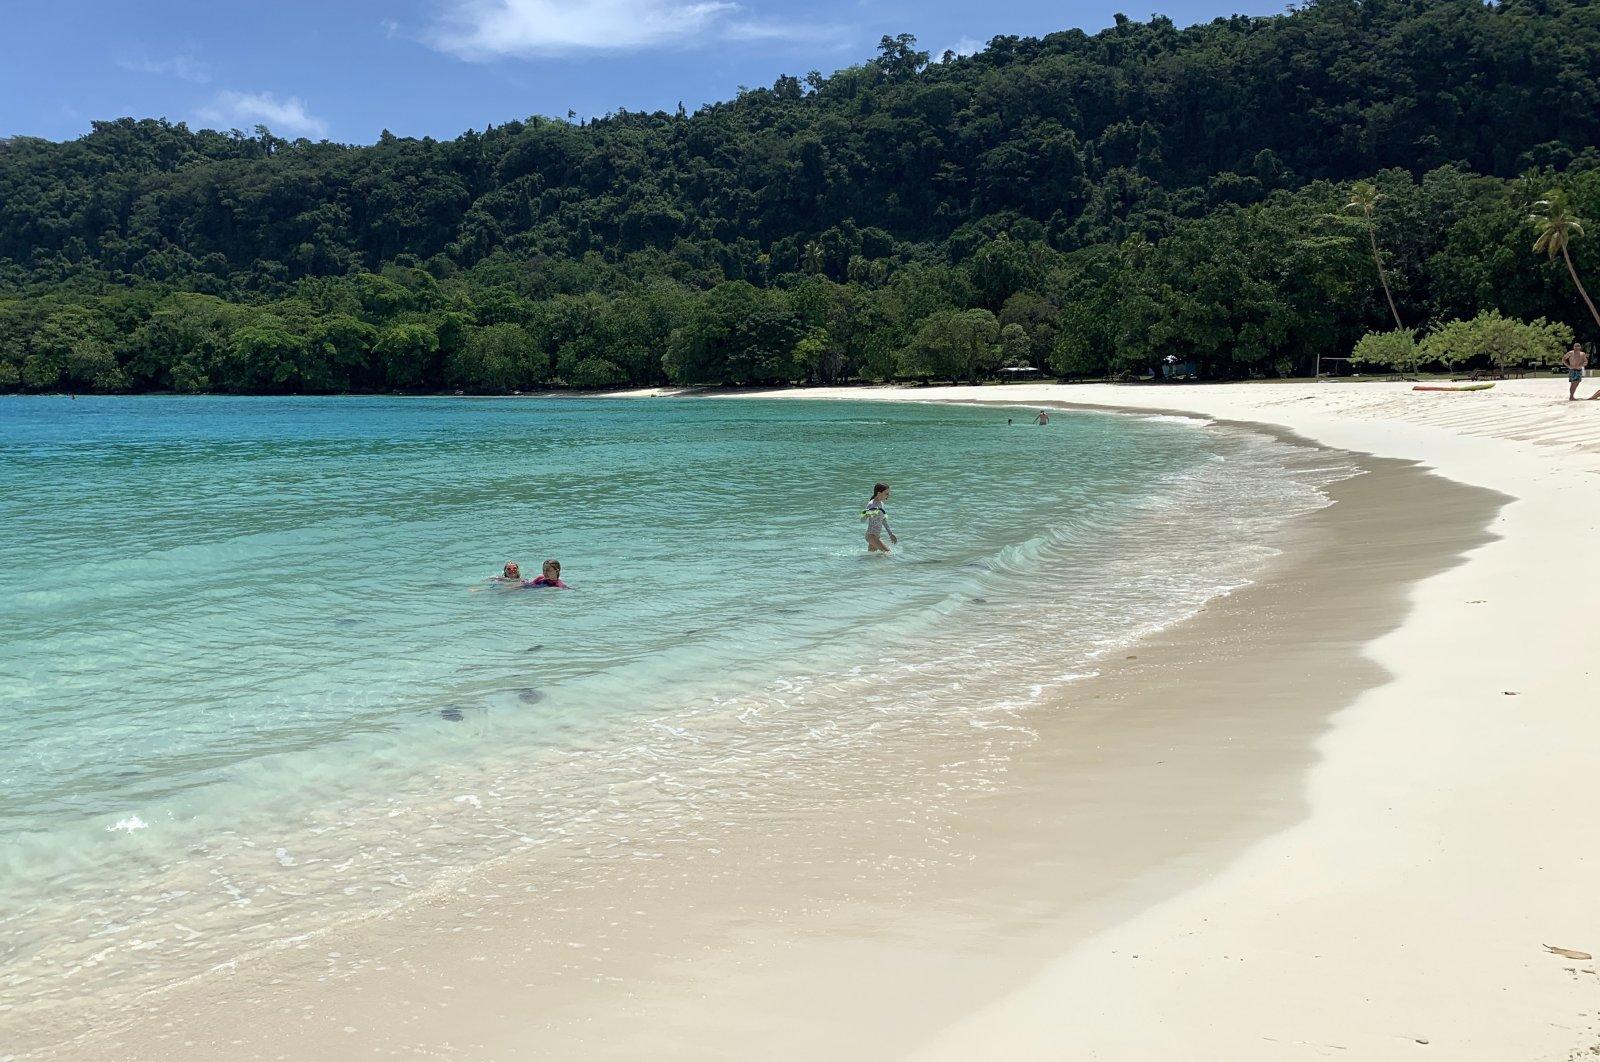 Champagne Beach on the island of Espiritu Santo, Vanuatu, Jan. 9, 2020. (AAP via Reuters)